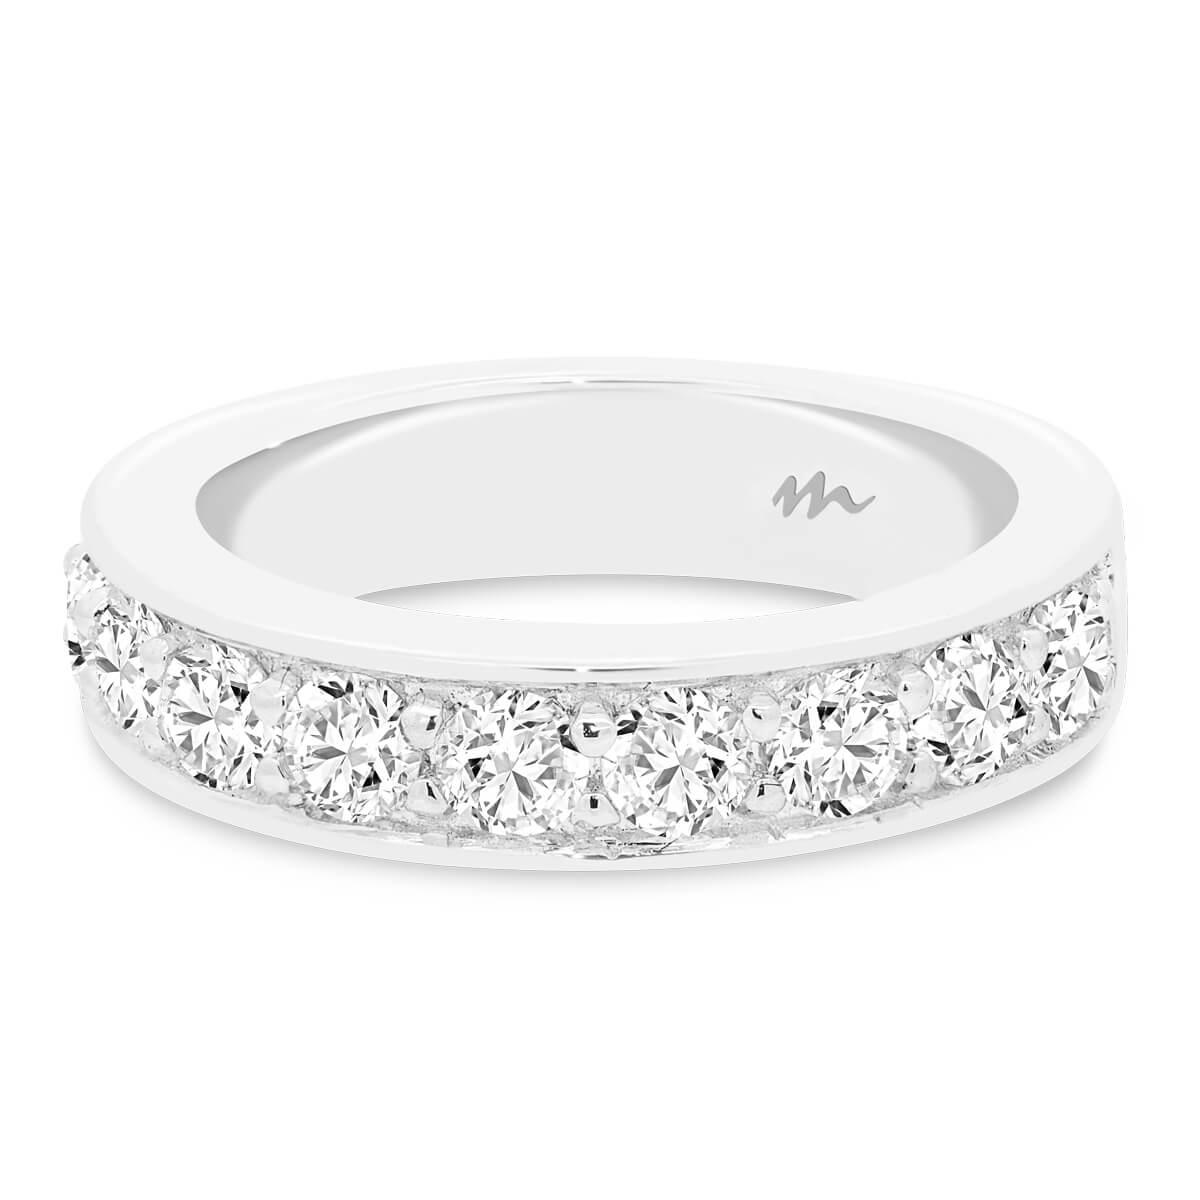 Millie 3.0 pave set Moissanite wedding ring